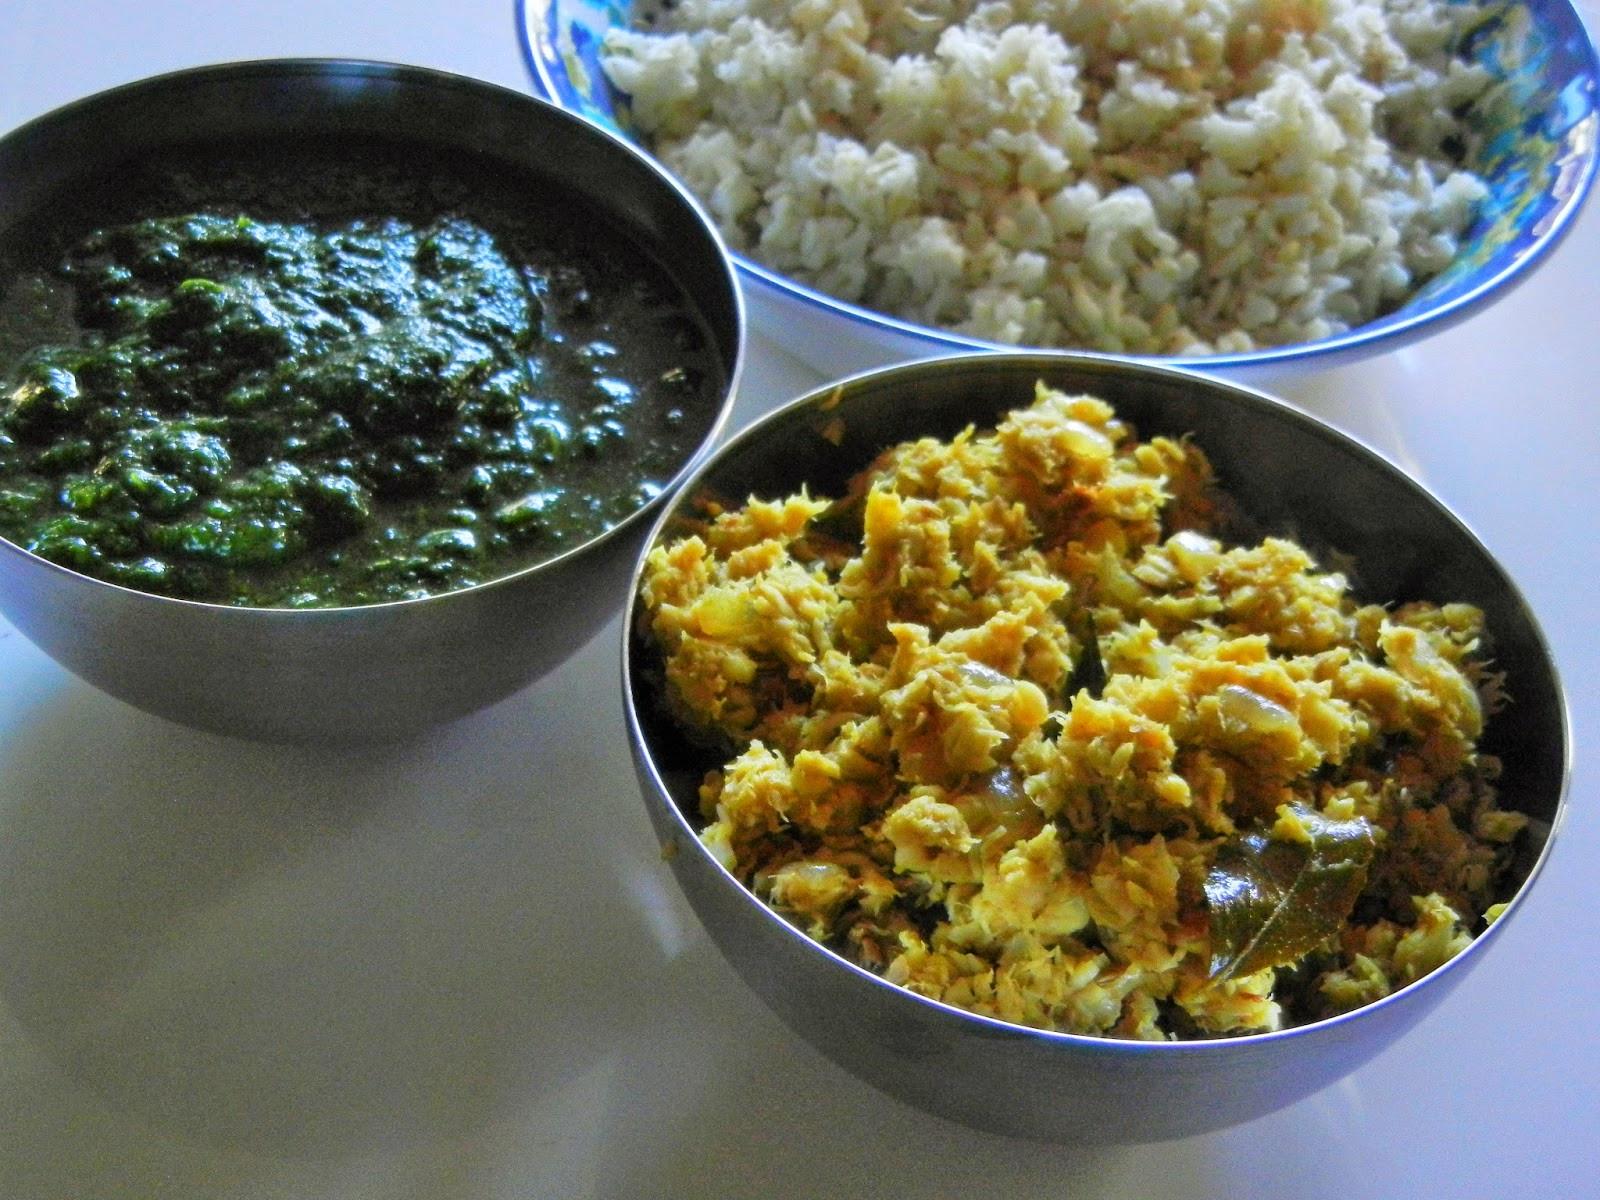 Diabetic Tilapia Recipes  Gita s Kitchen A blog for Indian diabetic recipes and